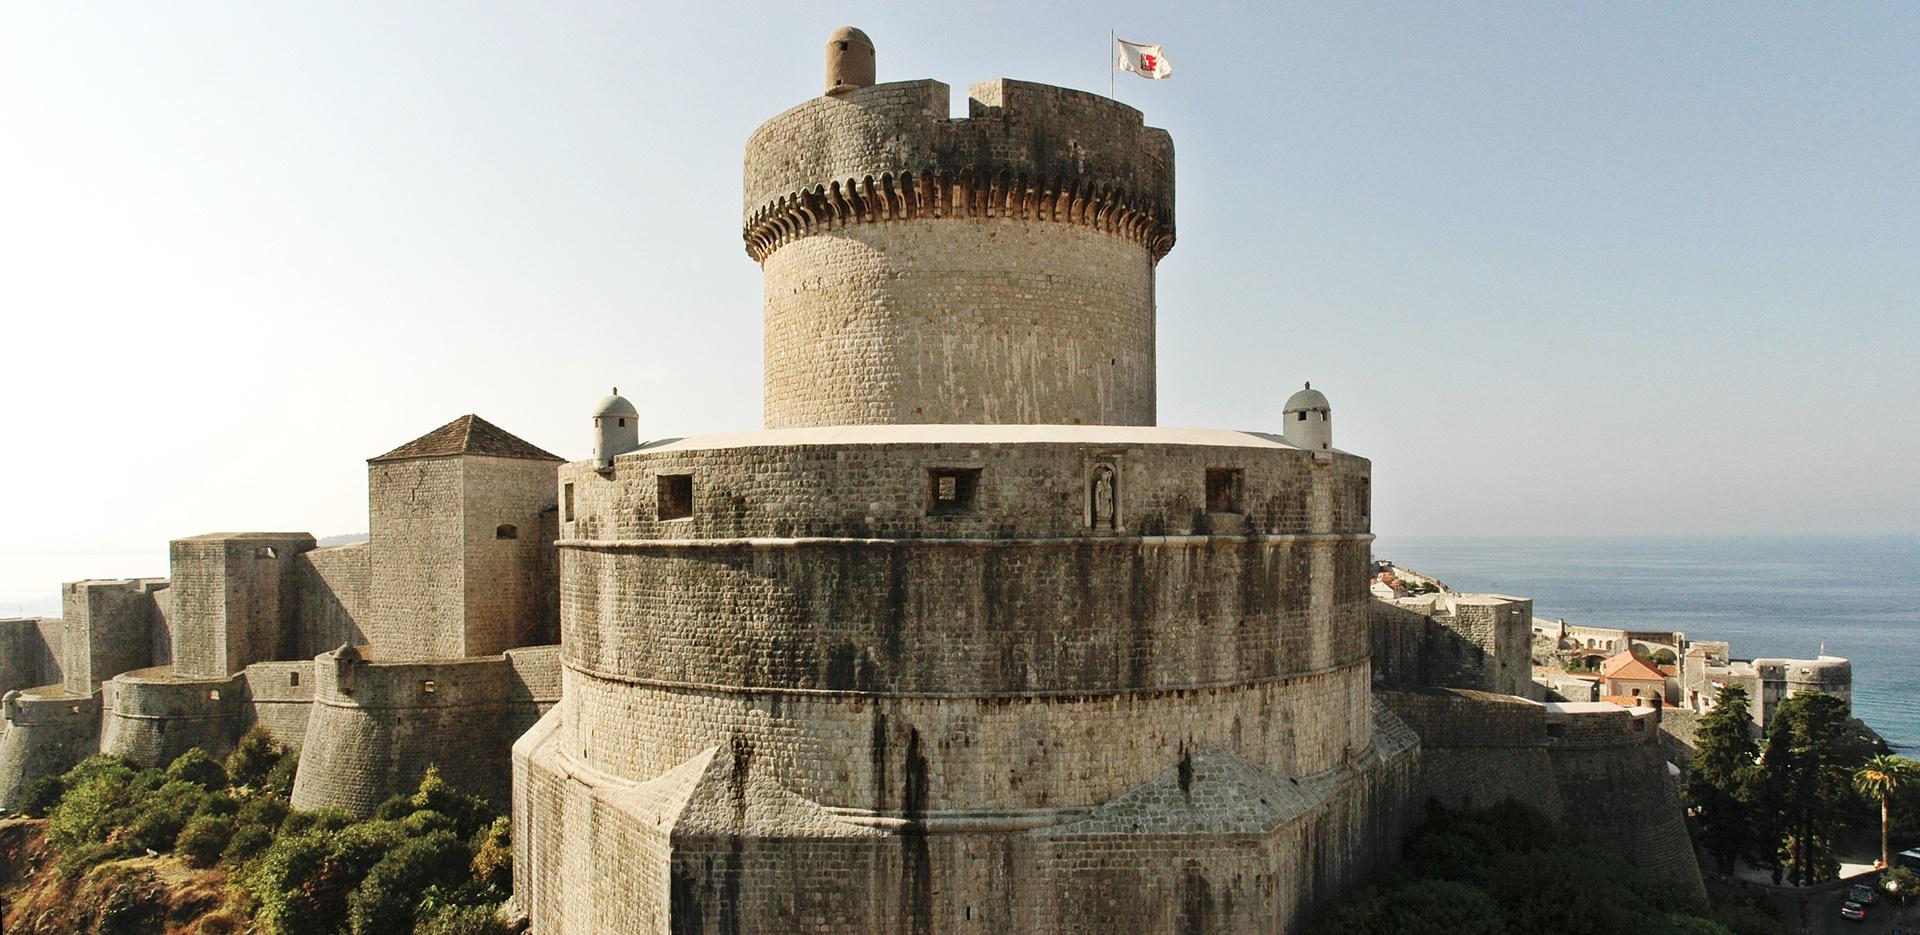 St. John's Fortress city walls Fortress monuments Dubrovnik GoDubrovnik Sponza Stradun Street cover